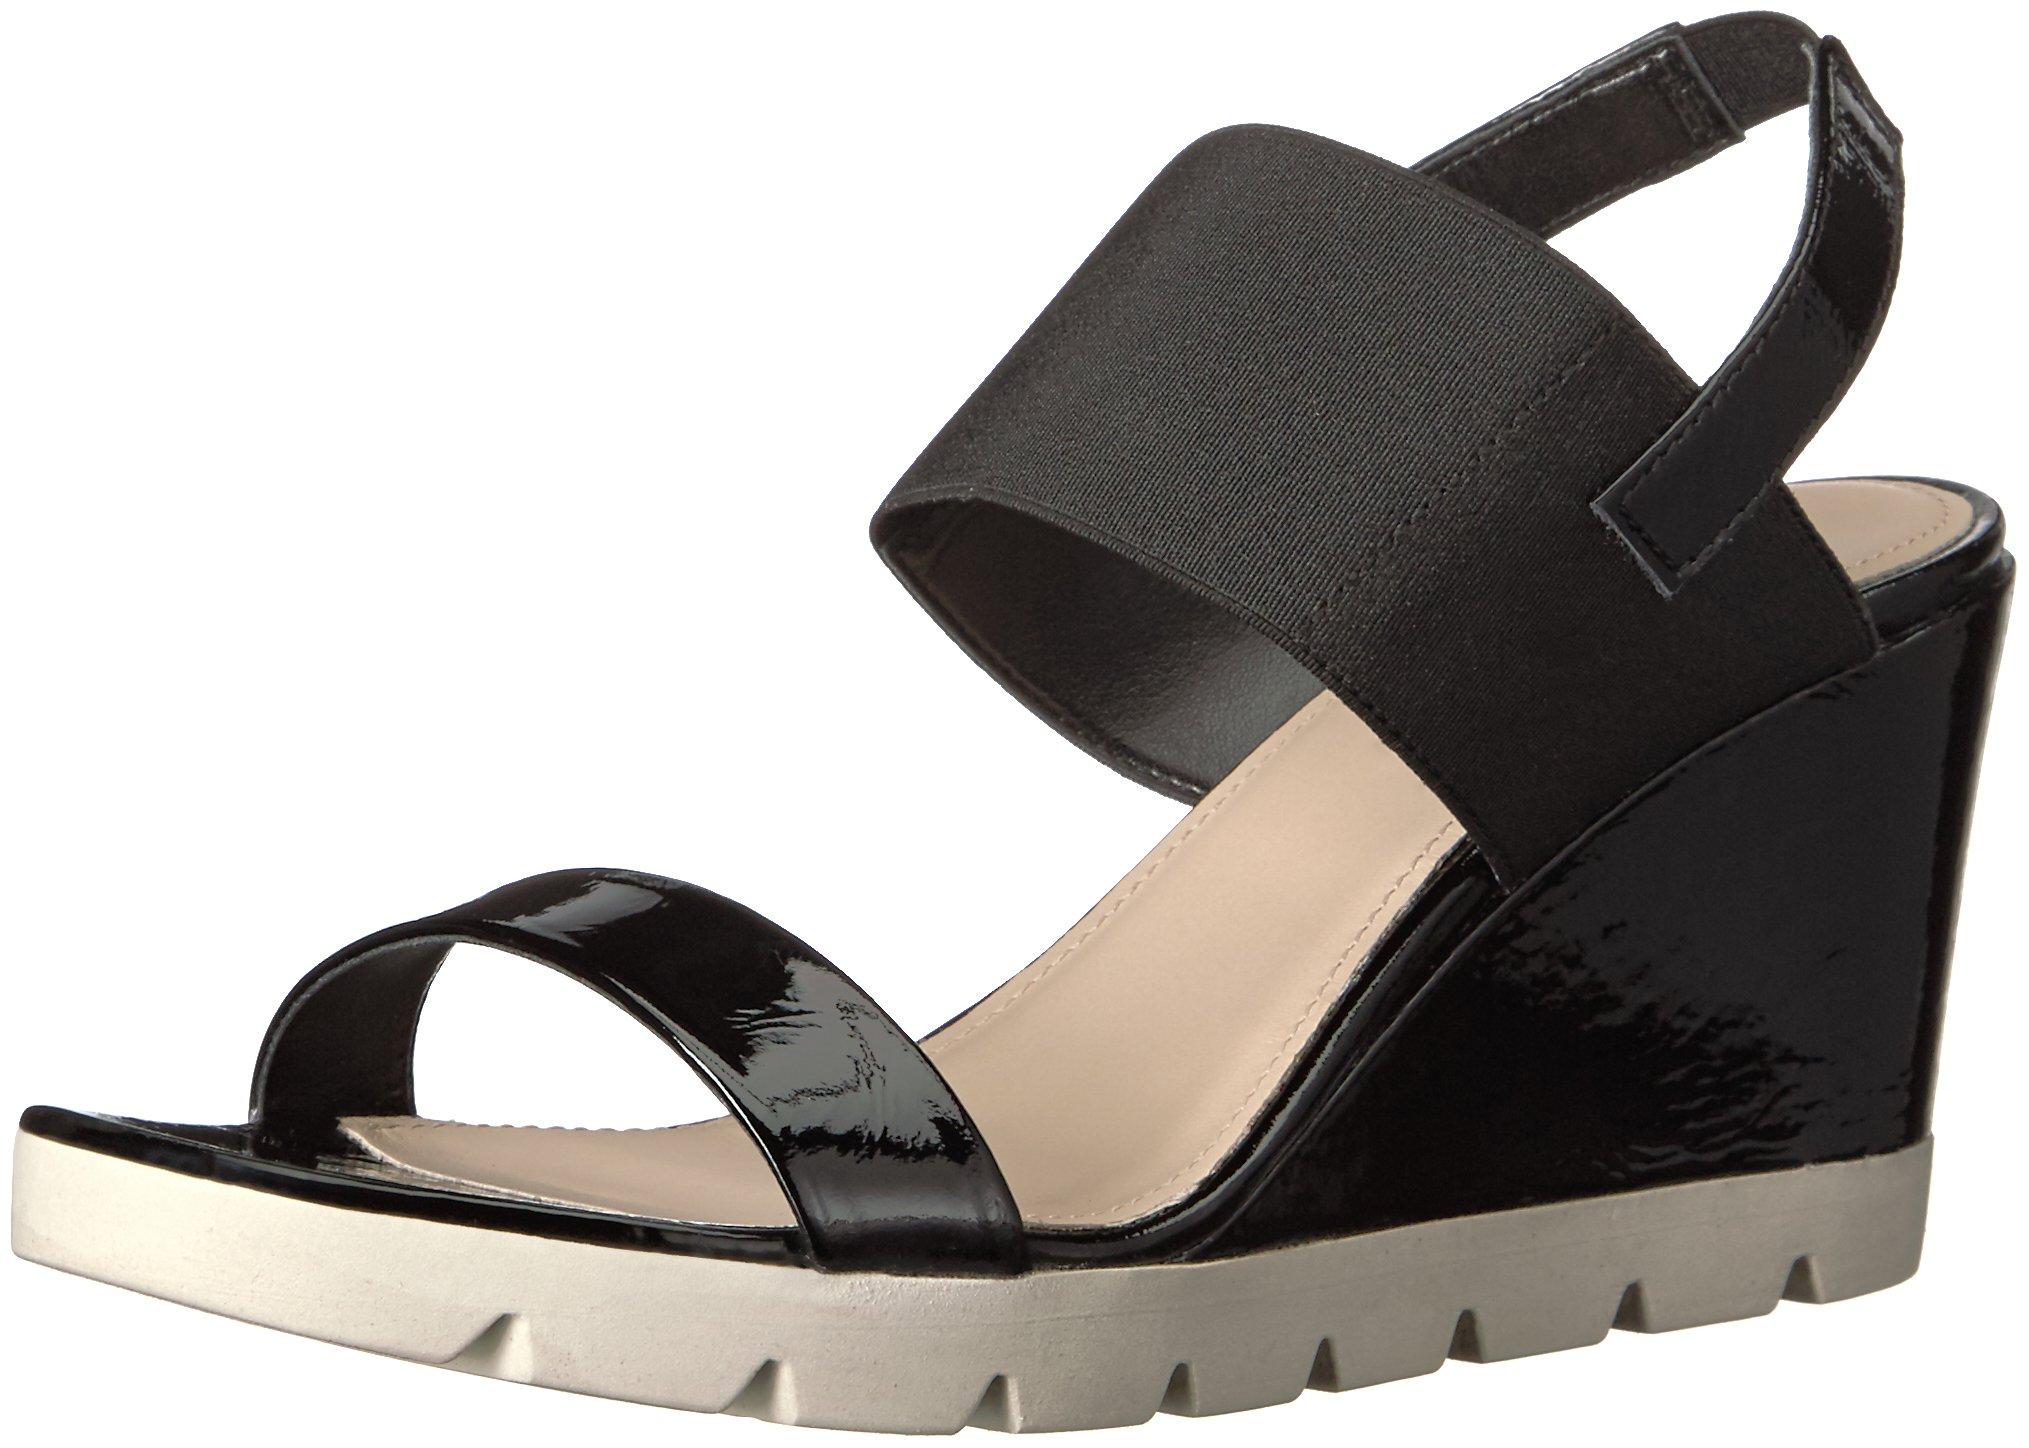 The FLEXX Women's Give a Lot Wedge Sandal, Black Cotton, 6 M US